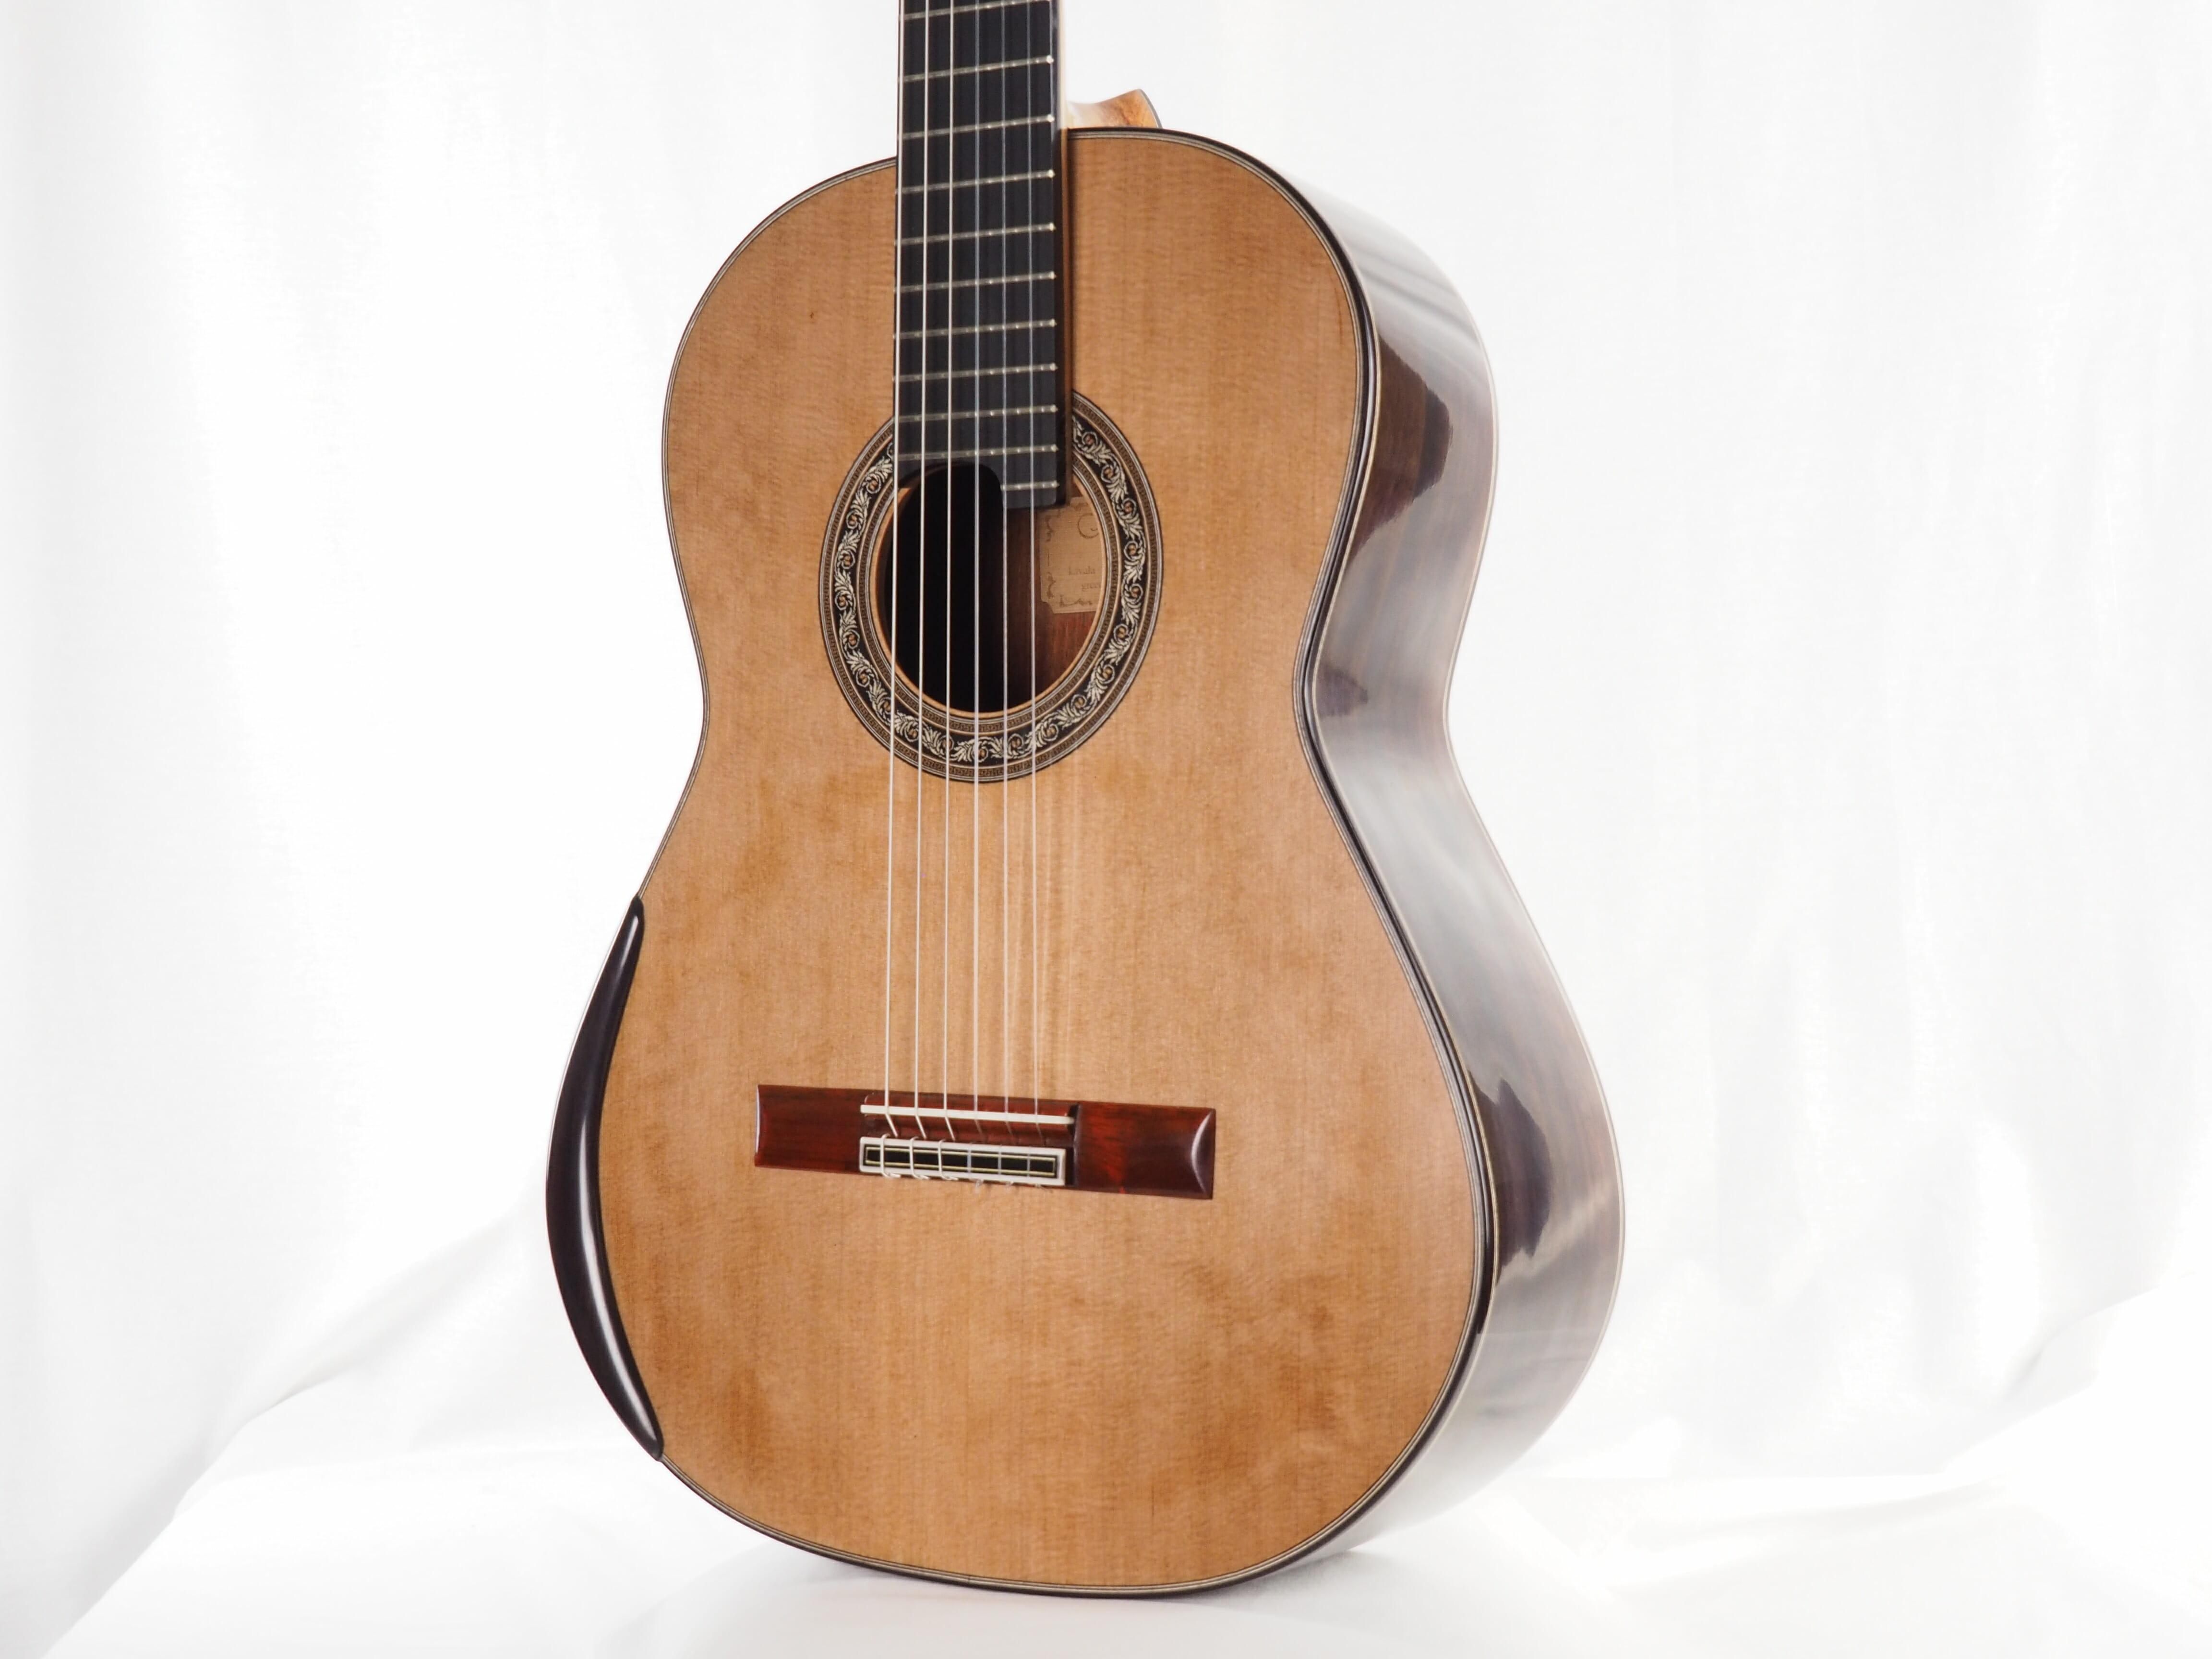 Luthier Koumridis Charalambos guitare classique n°87